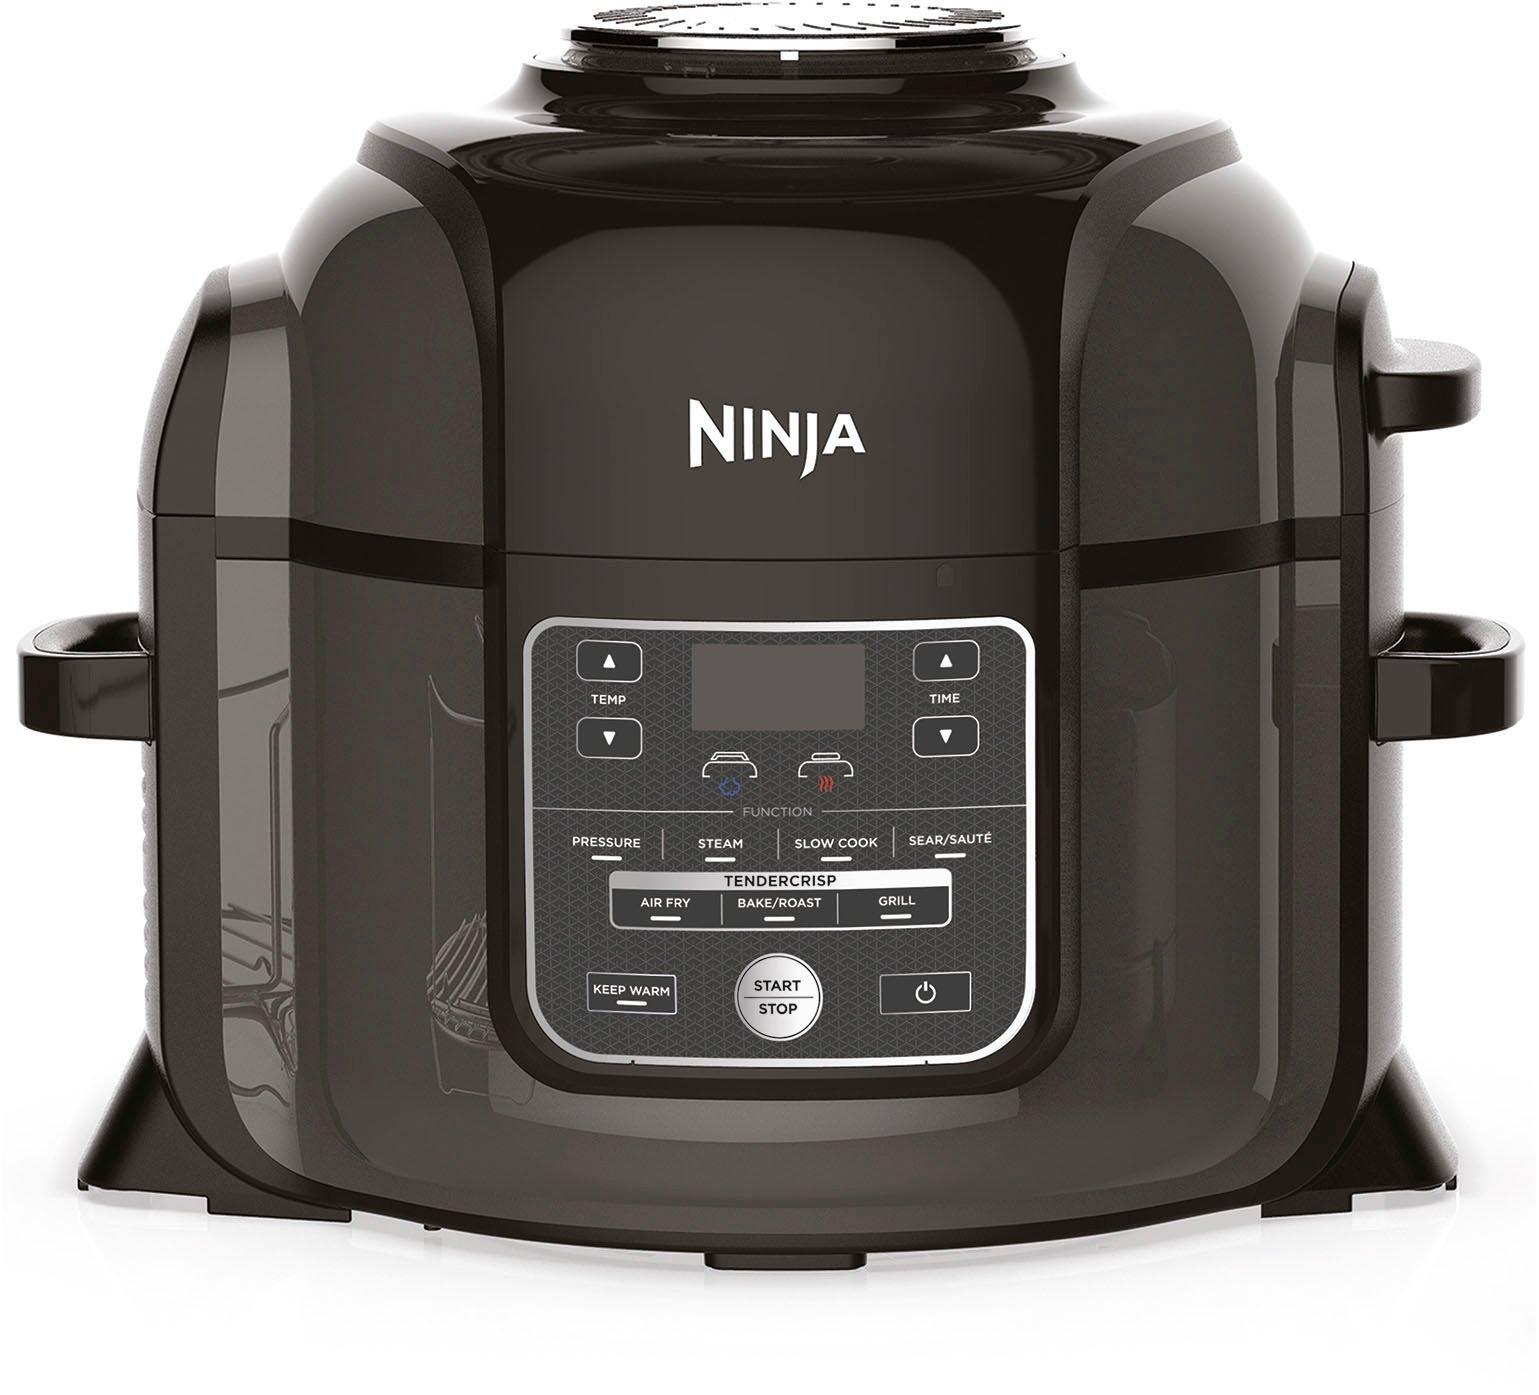 NINJA multi-cooker OP300EU Schnellkochtopf; Heißluftfritteuse - gratis ruilen op otto.nl